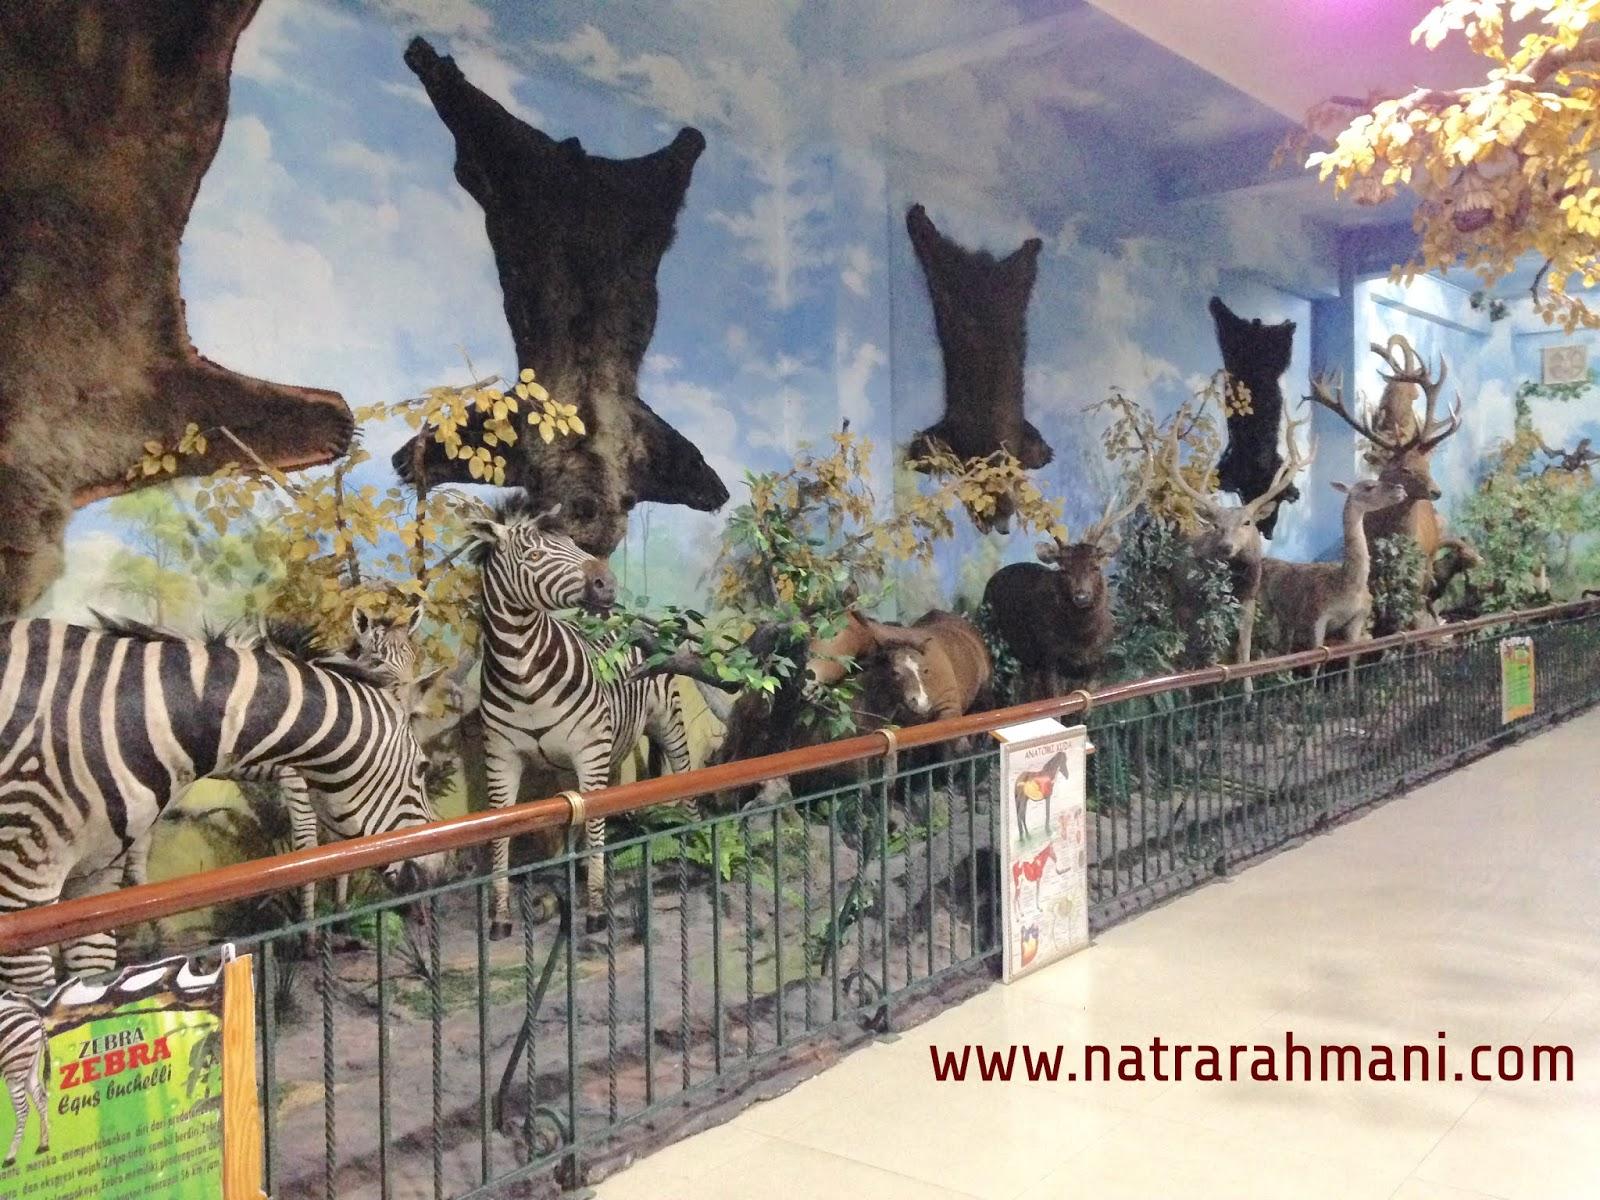 rahmat-international-wildlife-museum-gallery